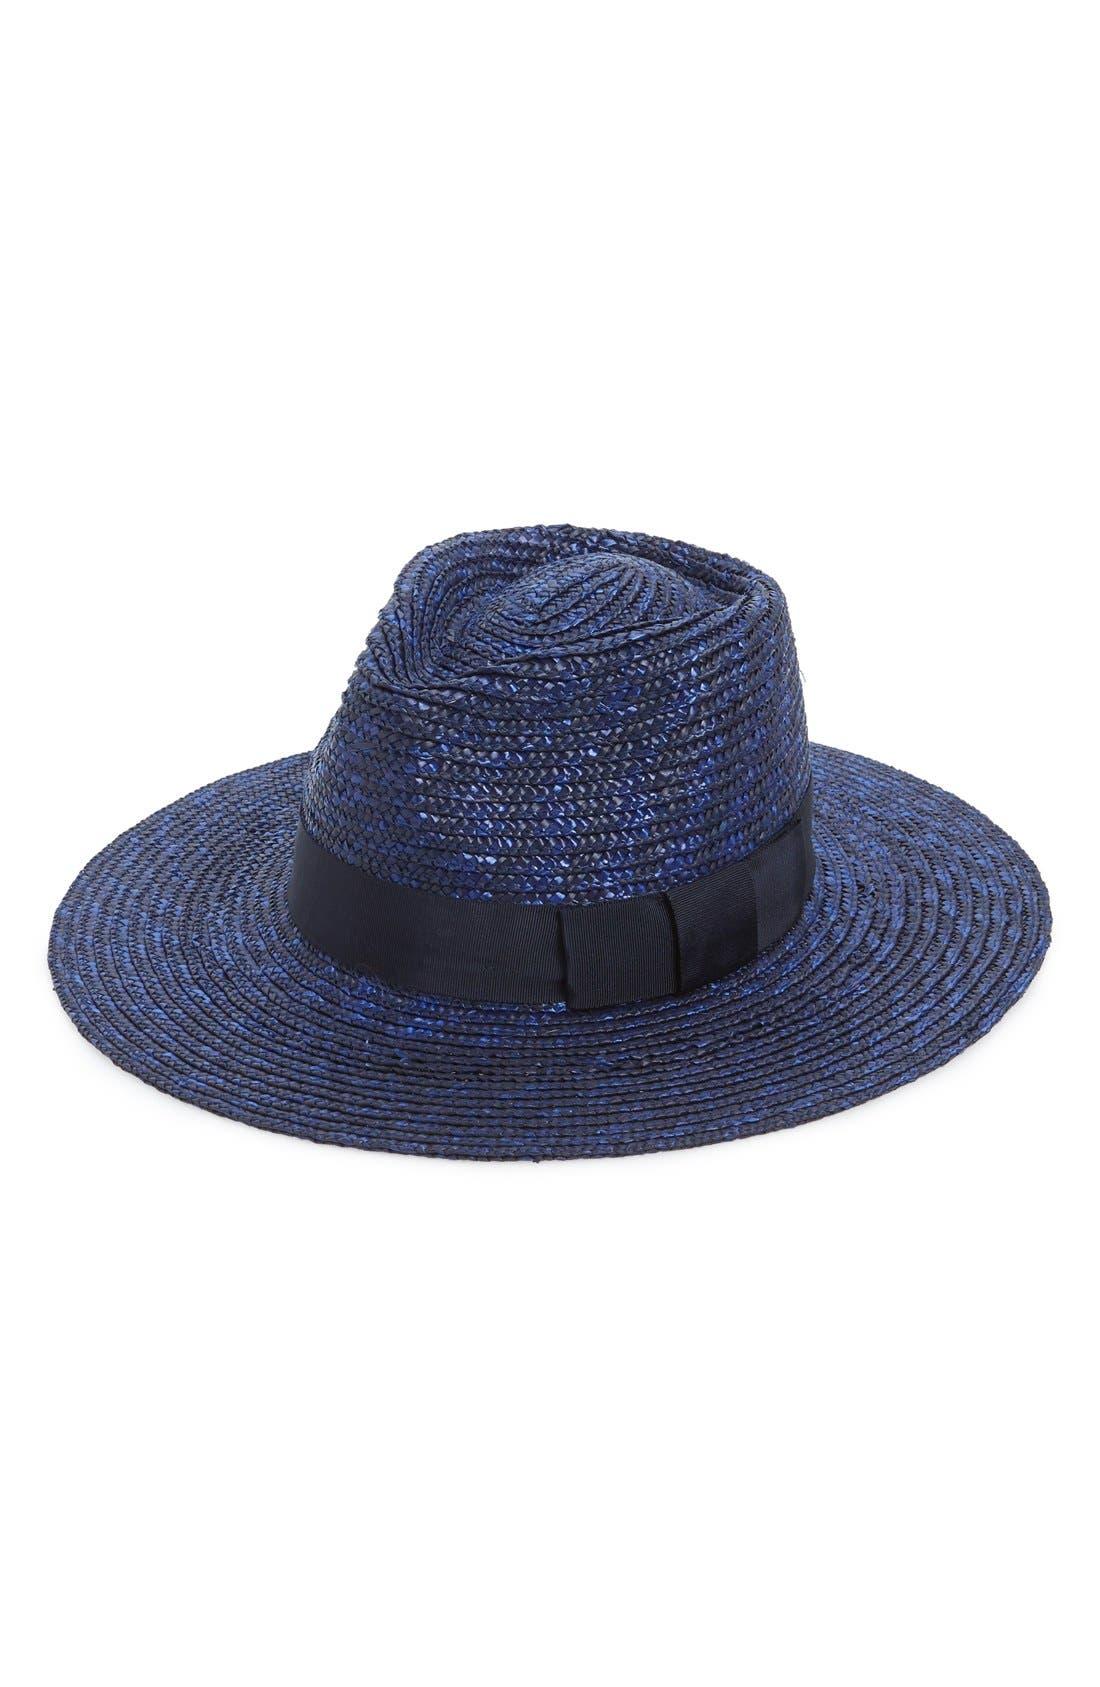 'Joanna' Straw Hat,                             Main thumbnail 1, color,                             MIDNIGHT